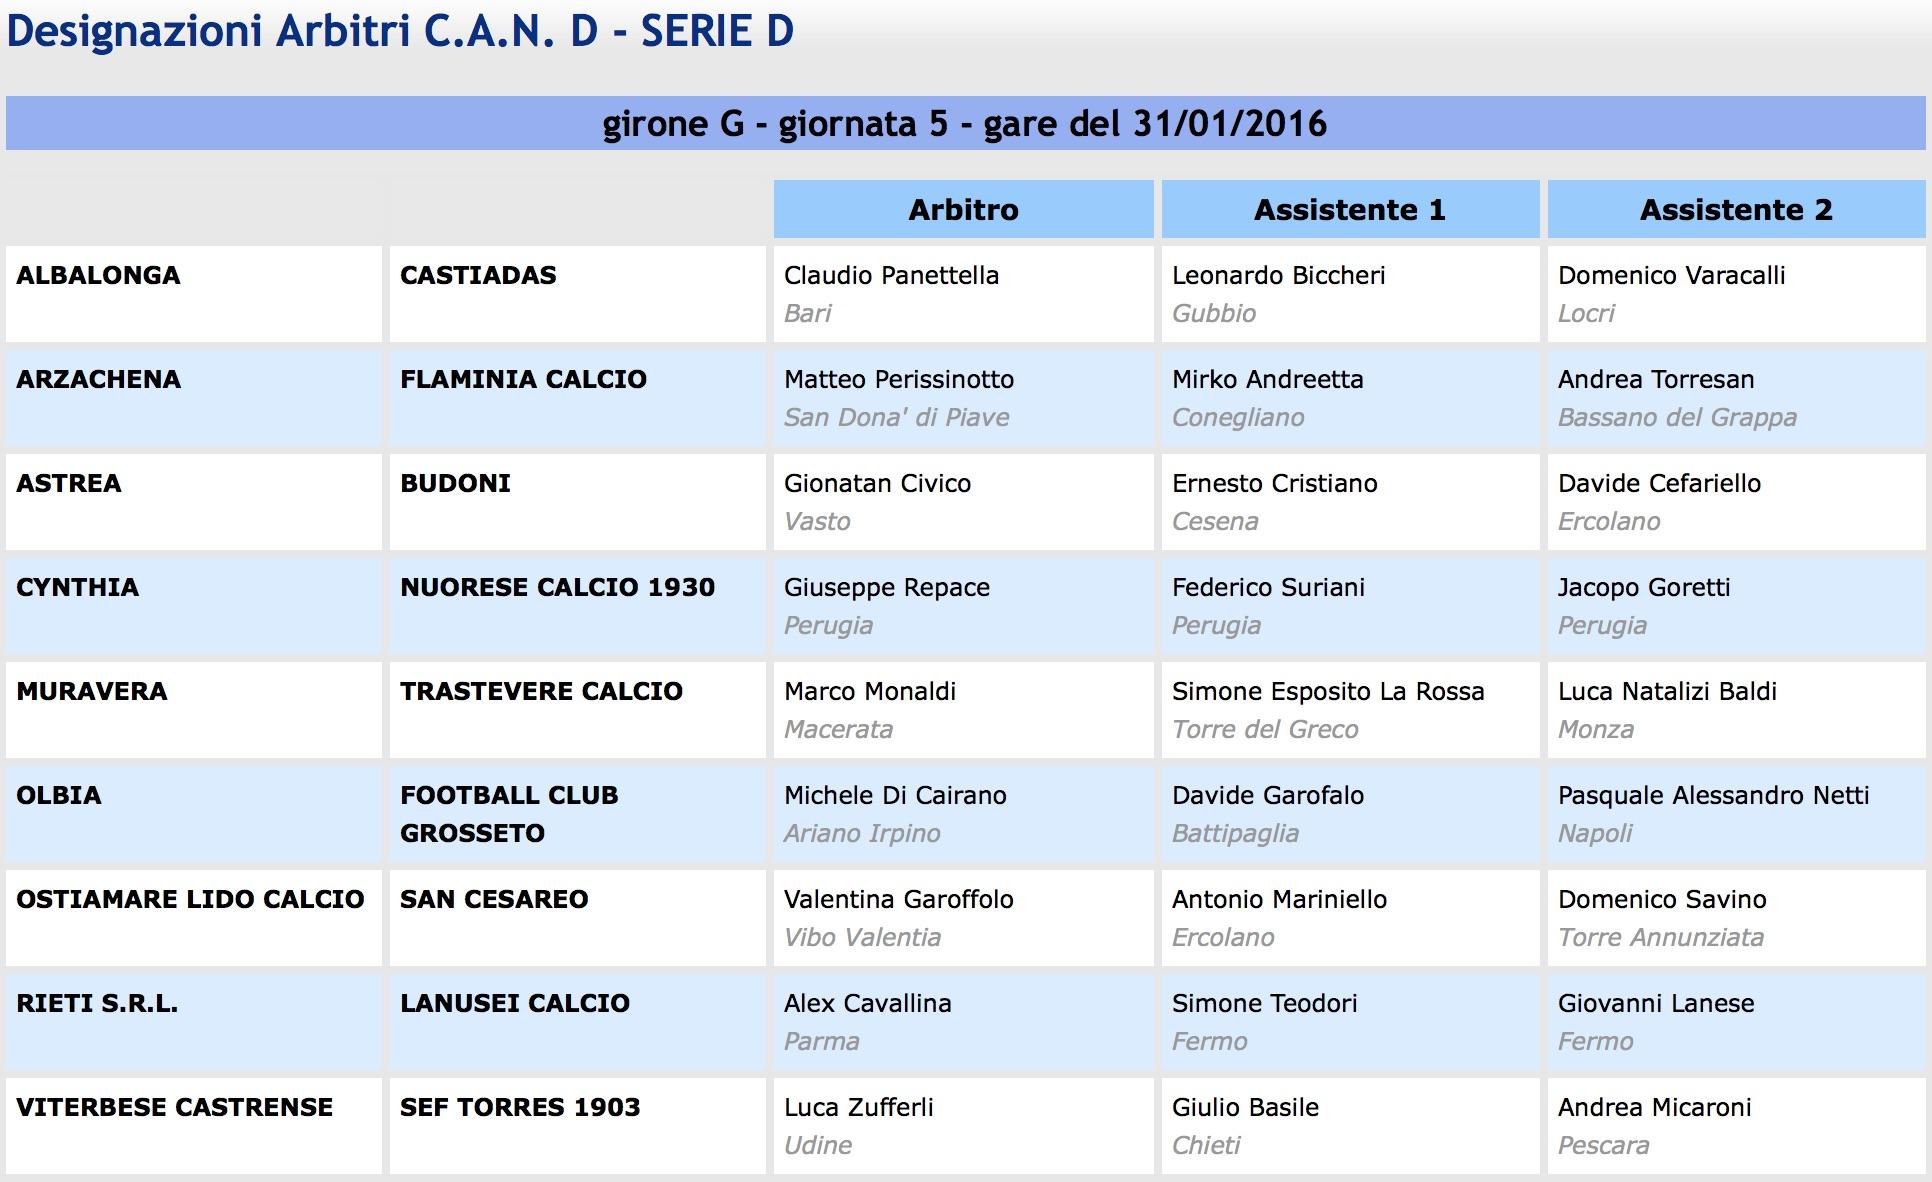 designazioni arbitrali 21ª giornata Serie D girone G